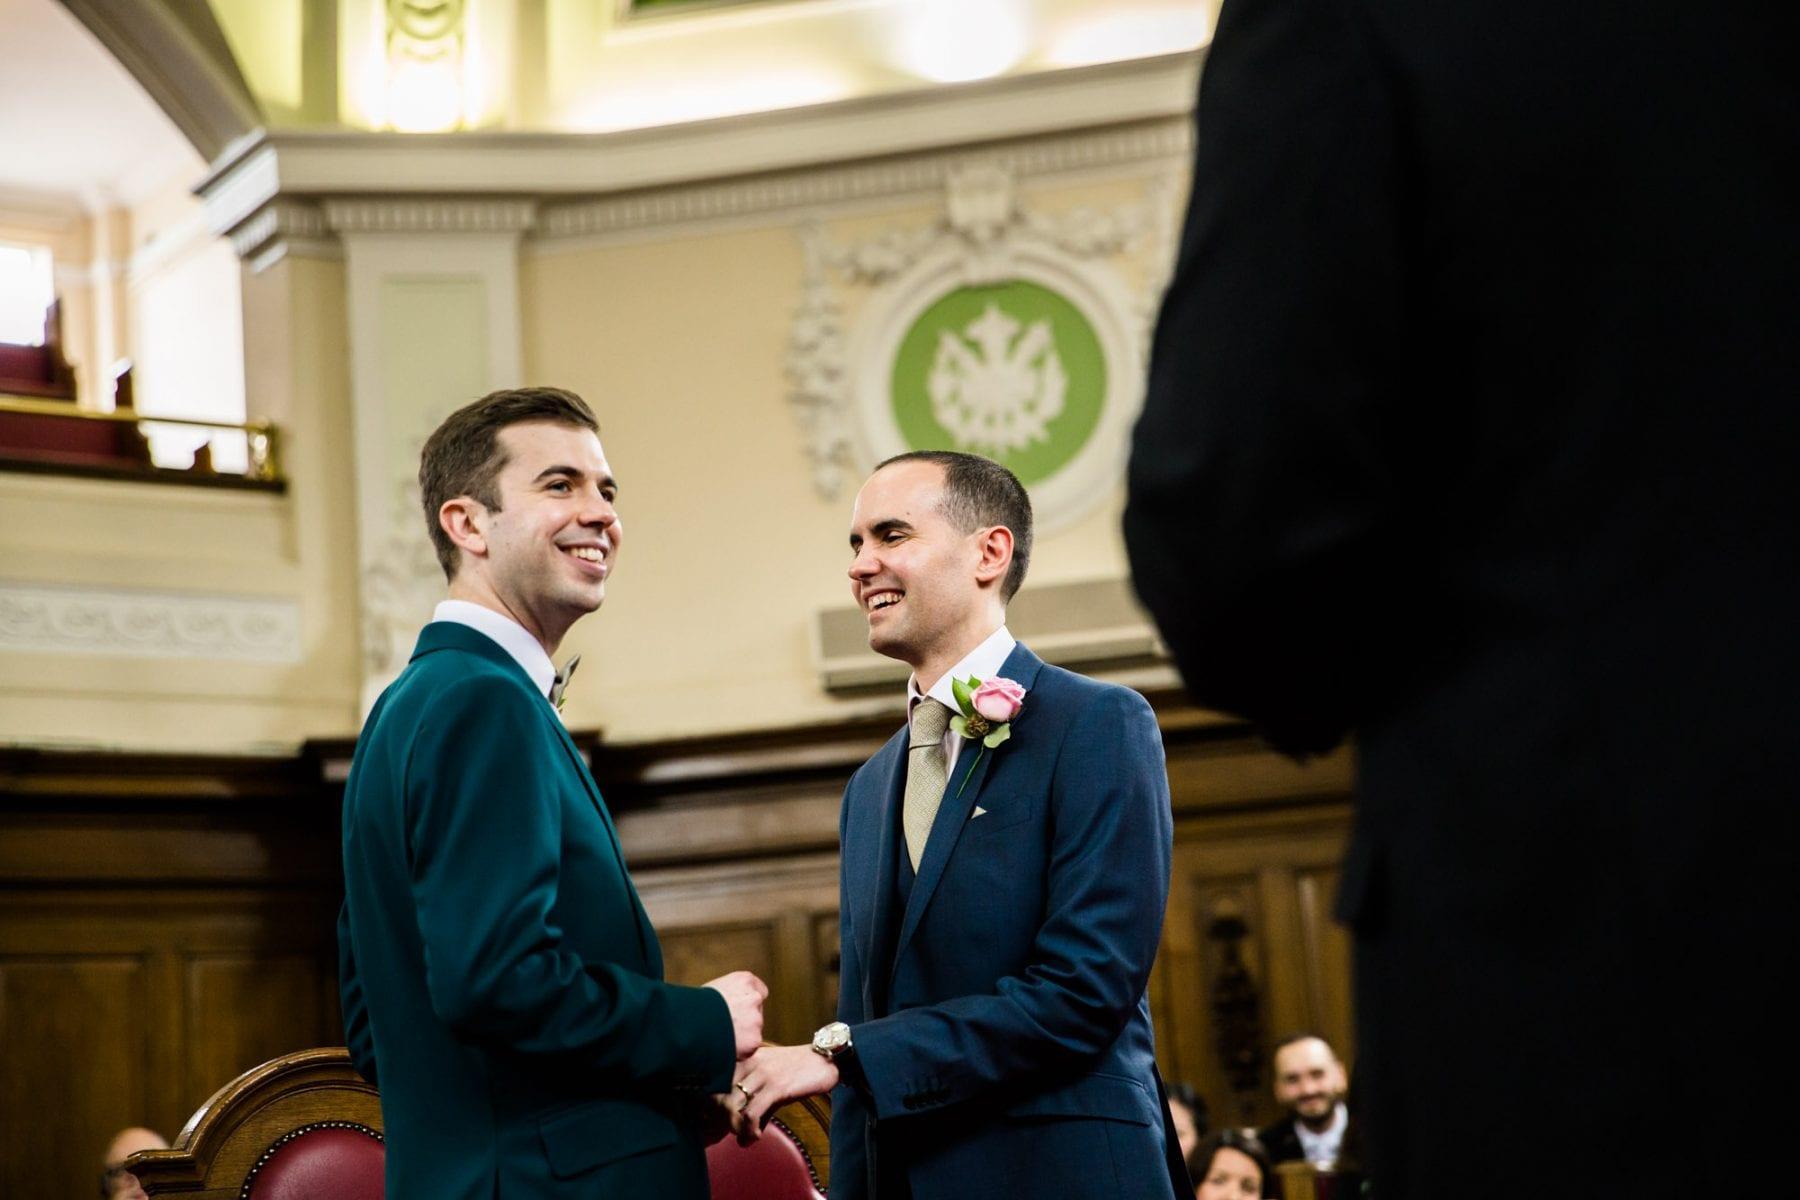 Islington Town Hall Wedding Ceremony Photographs